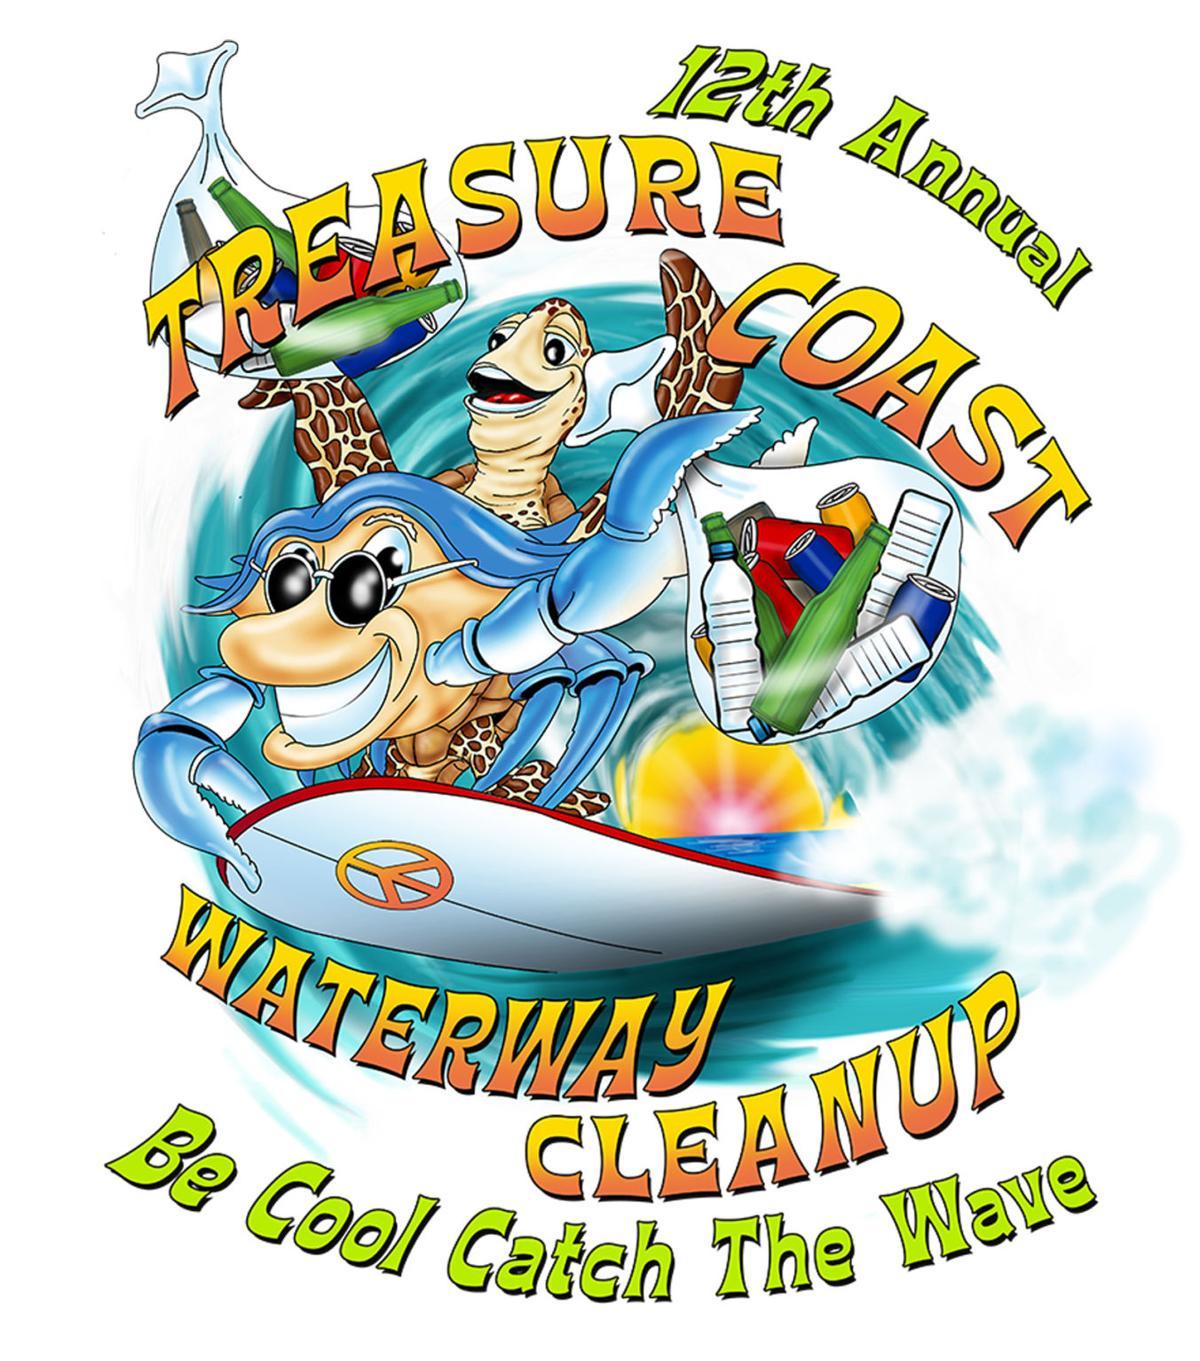 Treasure Coat Waterway Cleanup 2019 poster